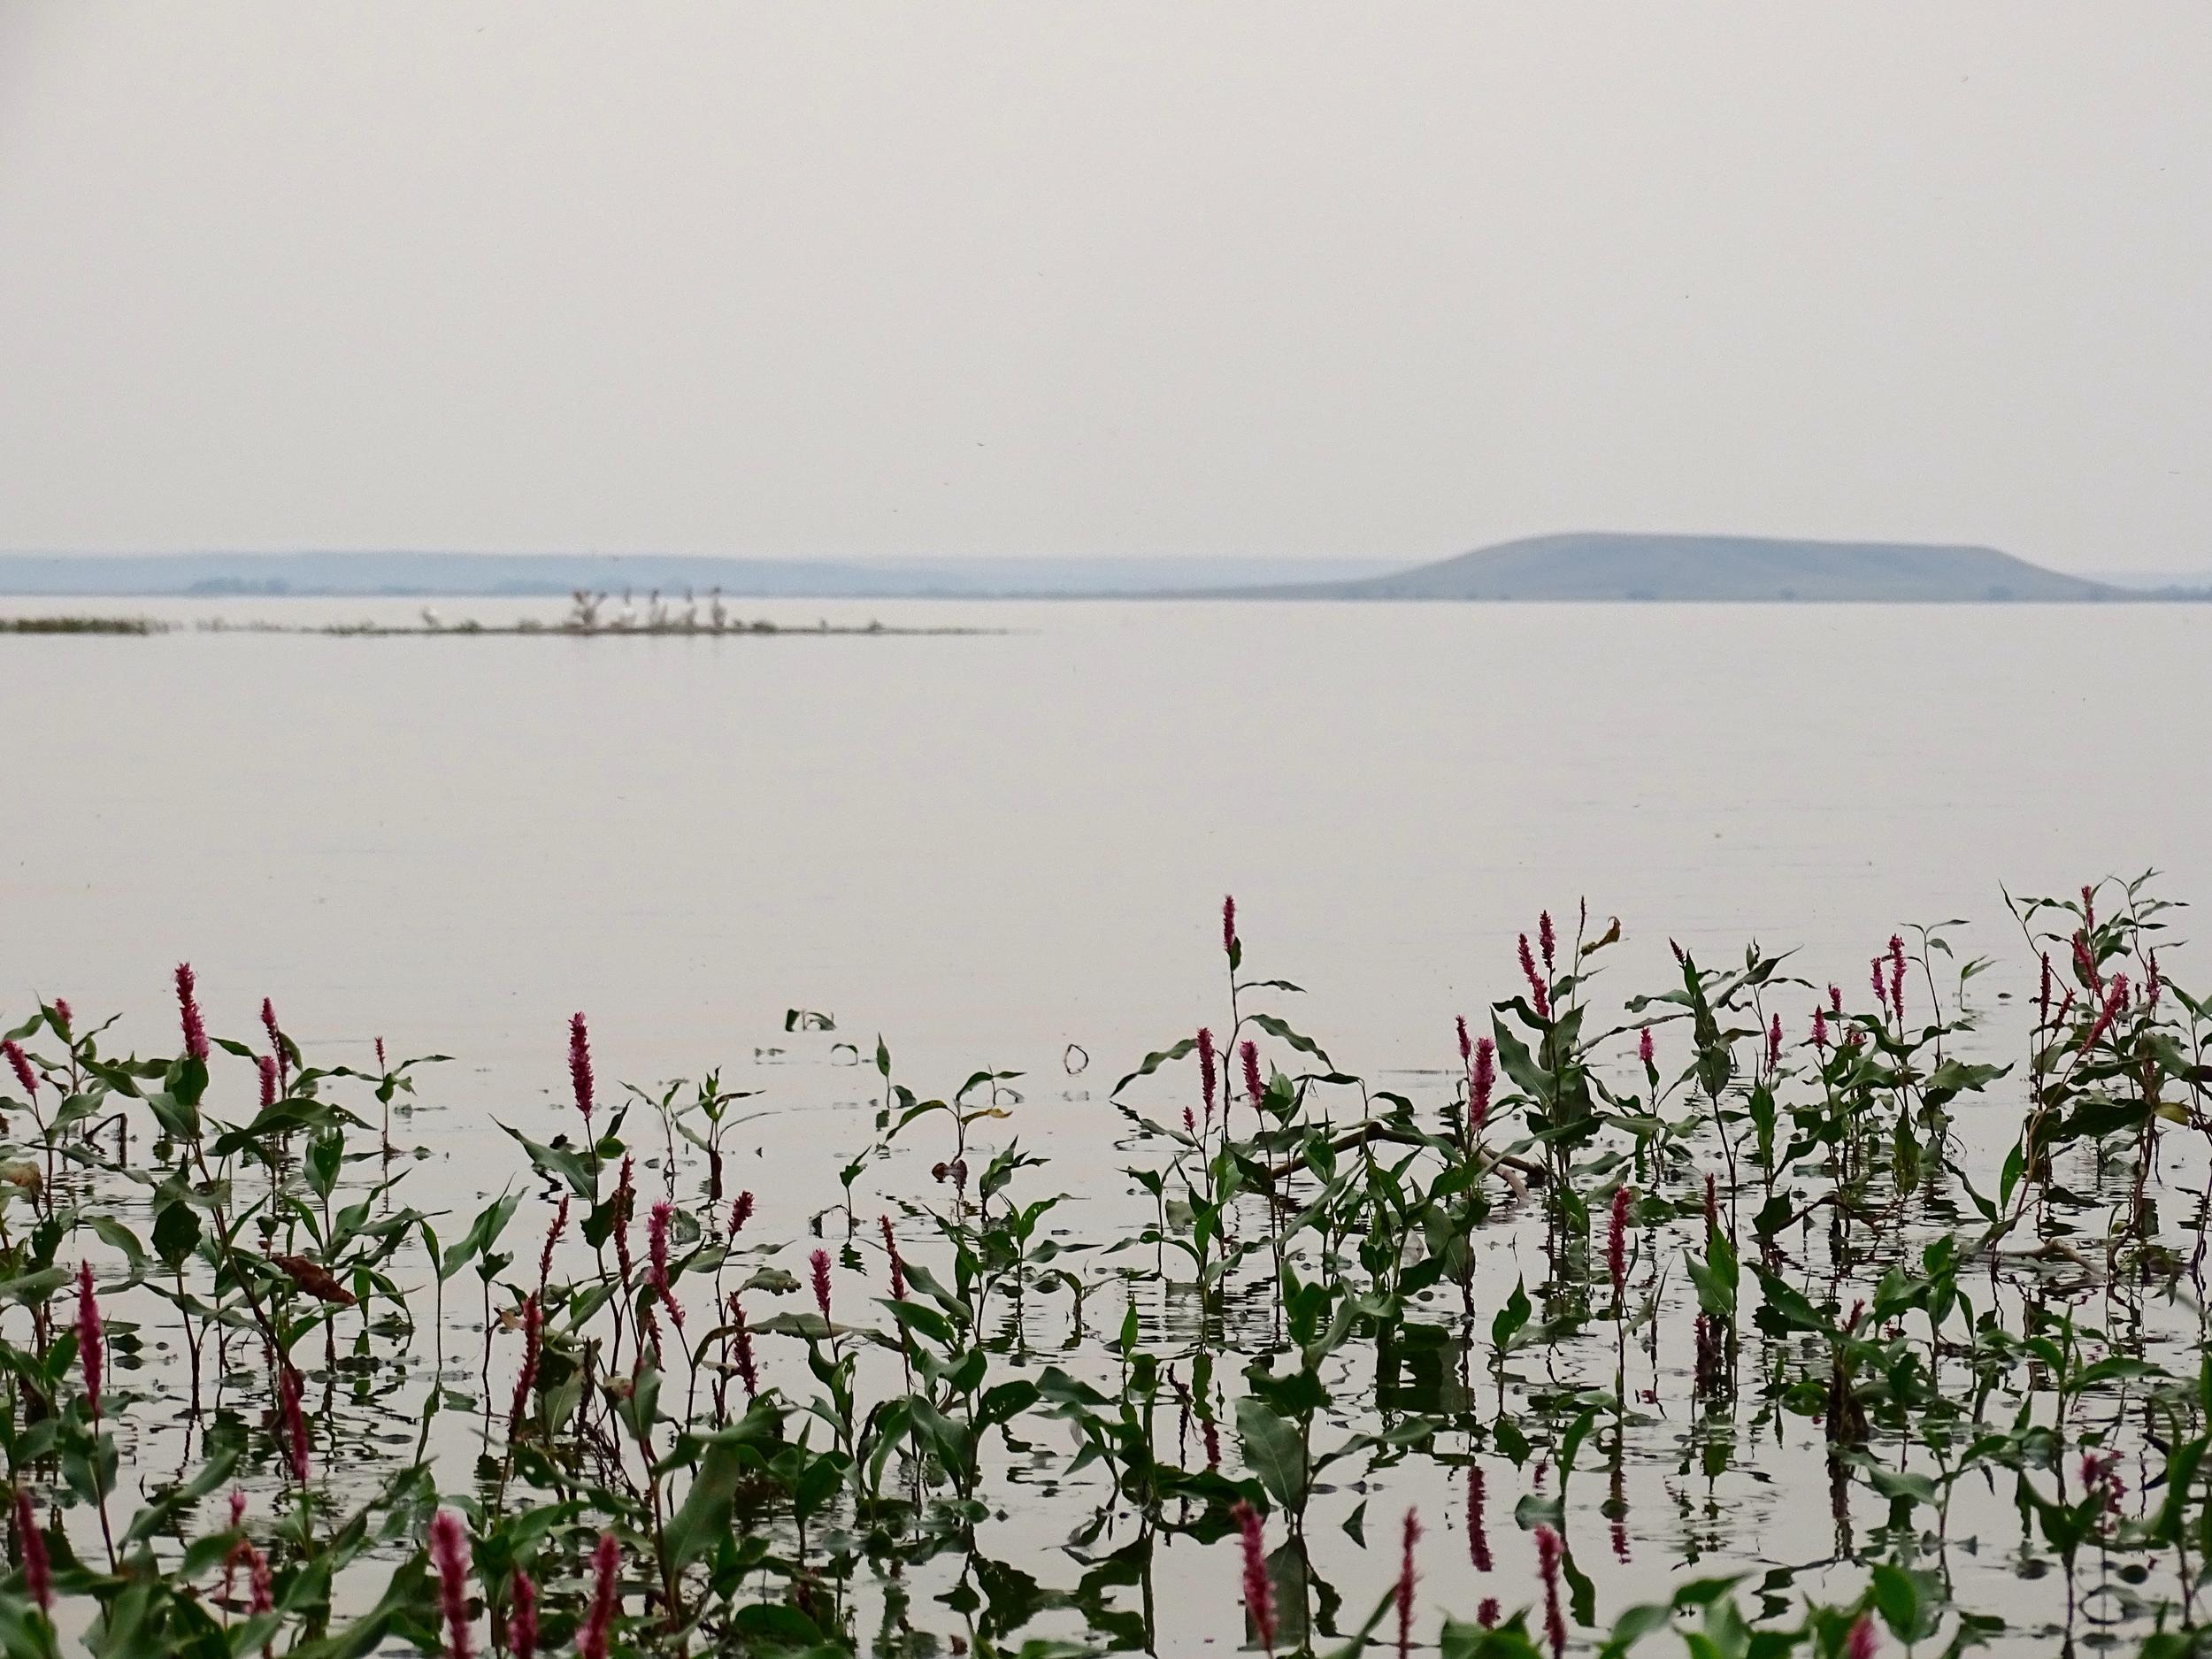 Evening at Nelson Reservoir in North Dakota